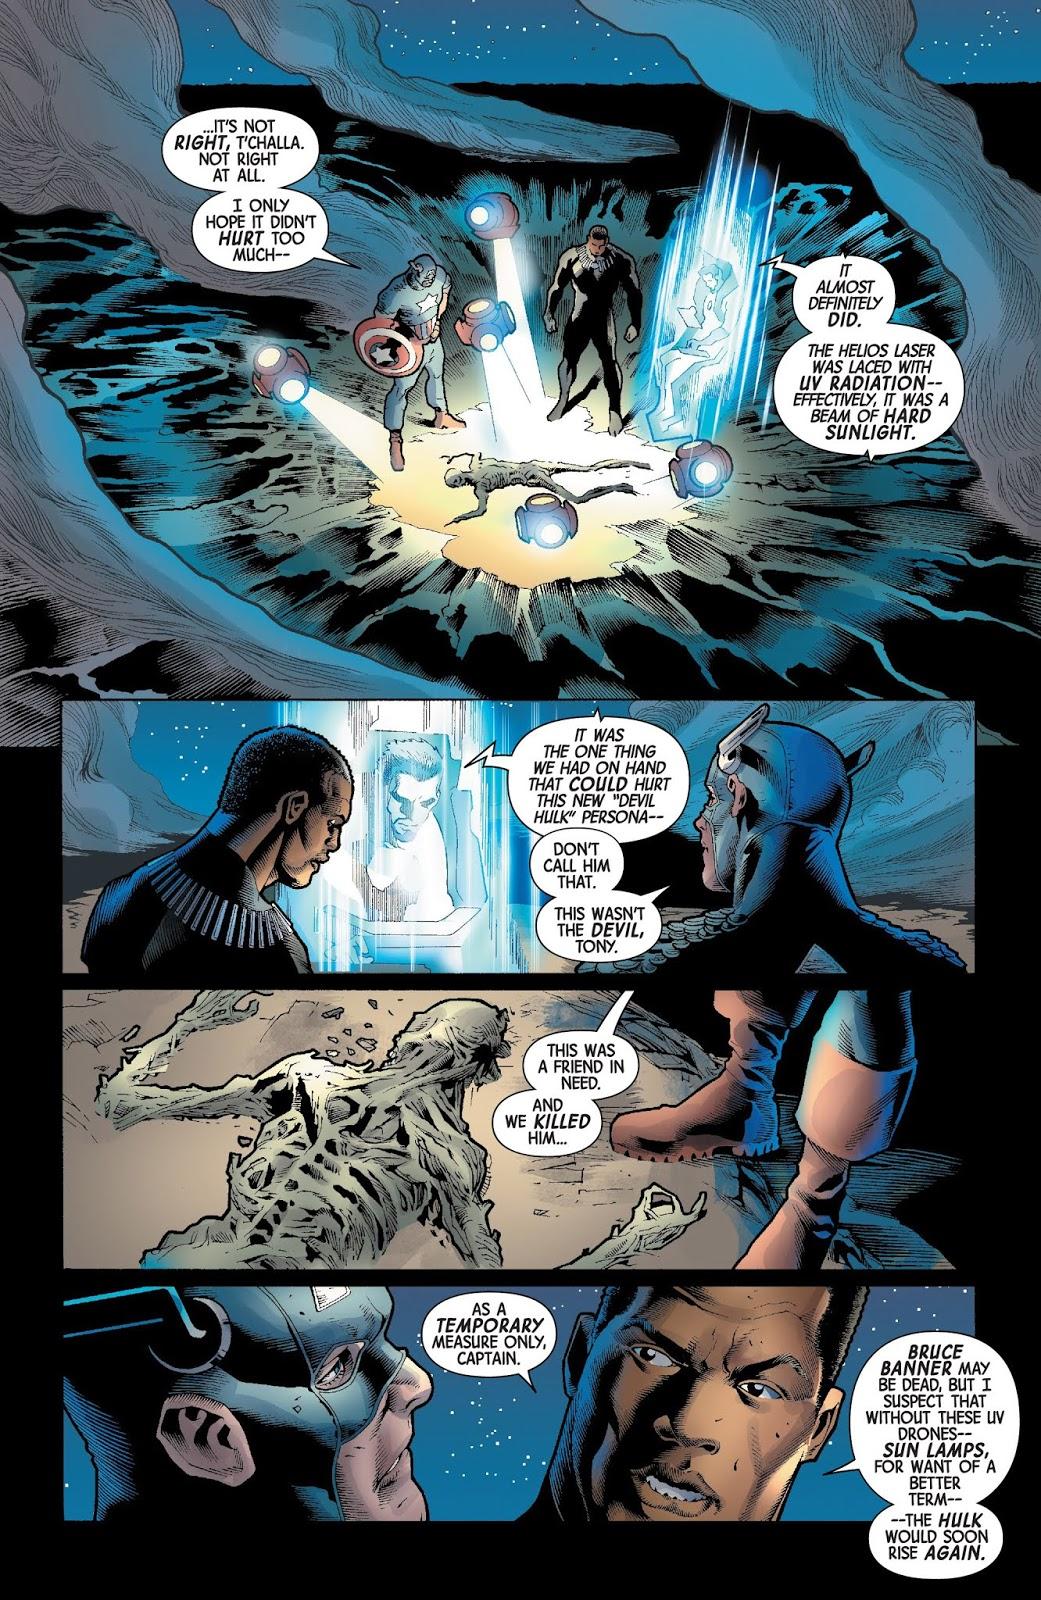 How Iron Man Defeated The Immortal Hulk